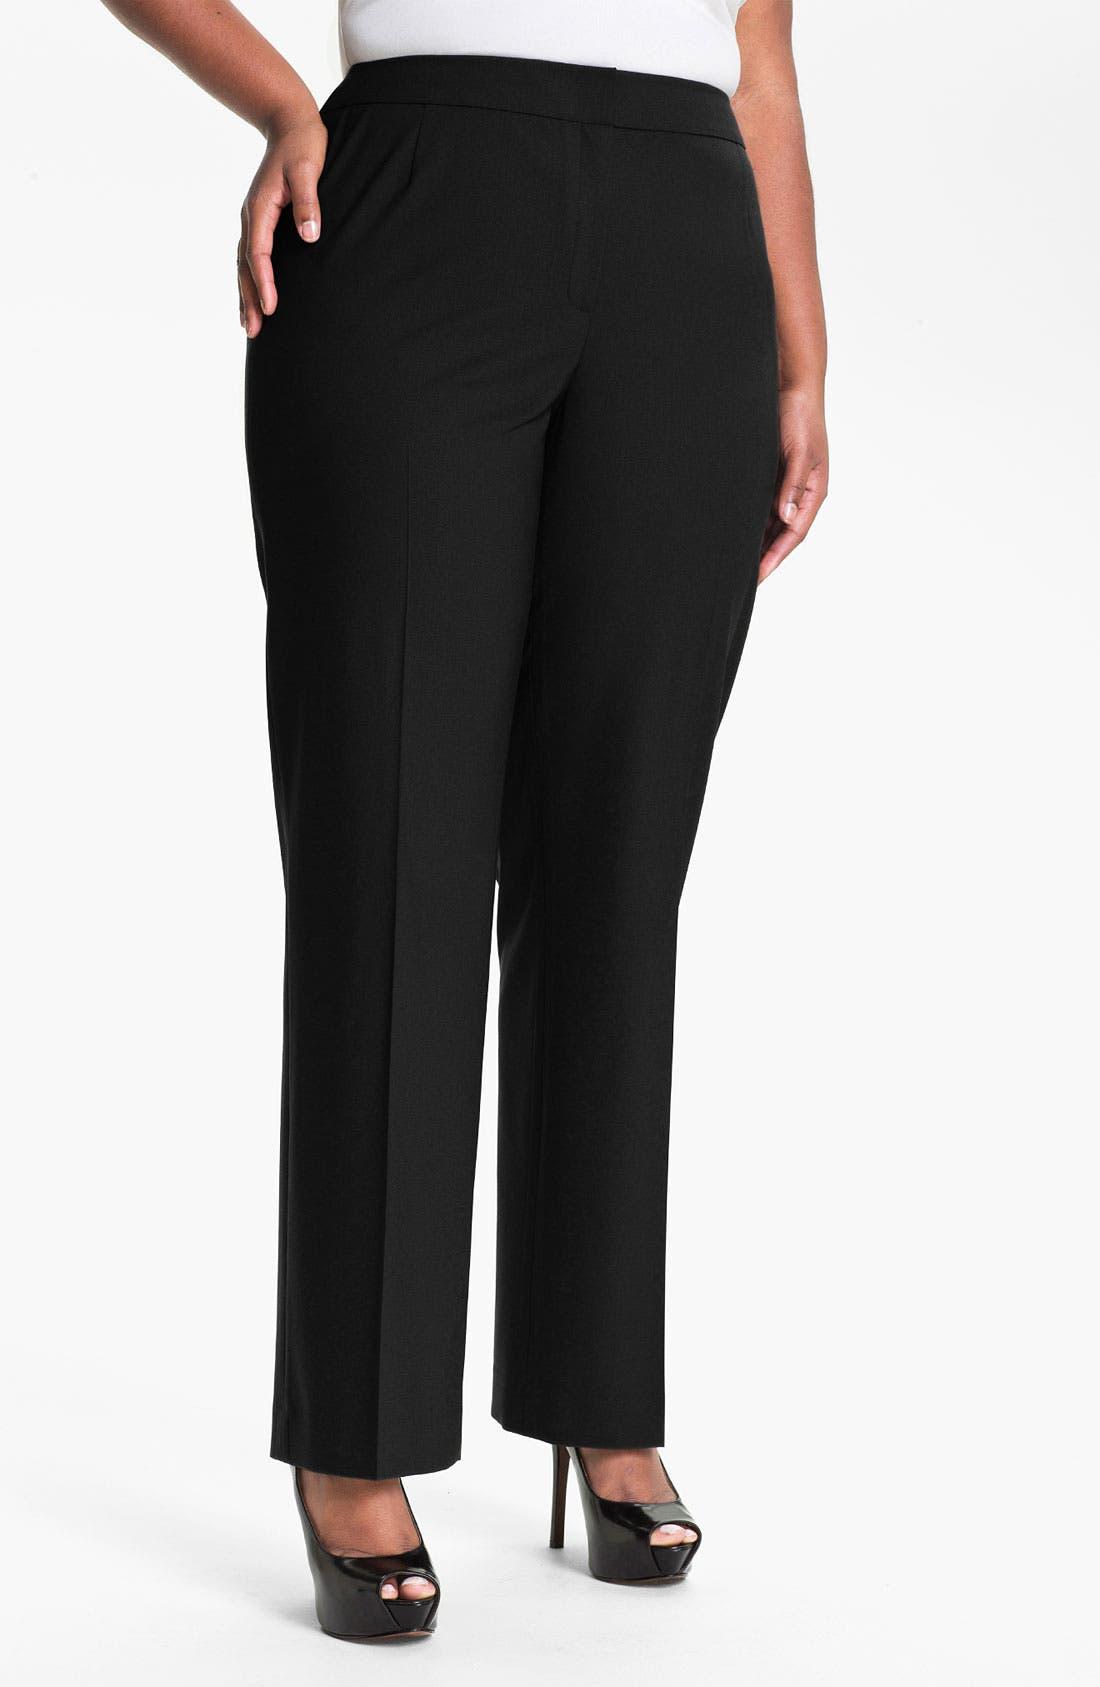 Main Image - Lafayette 148 New York 'Menswear' Trousers (Plus Size)